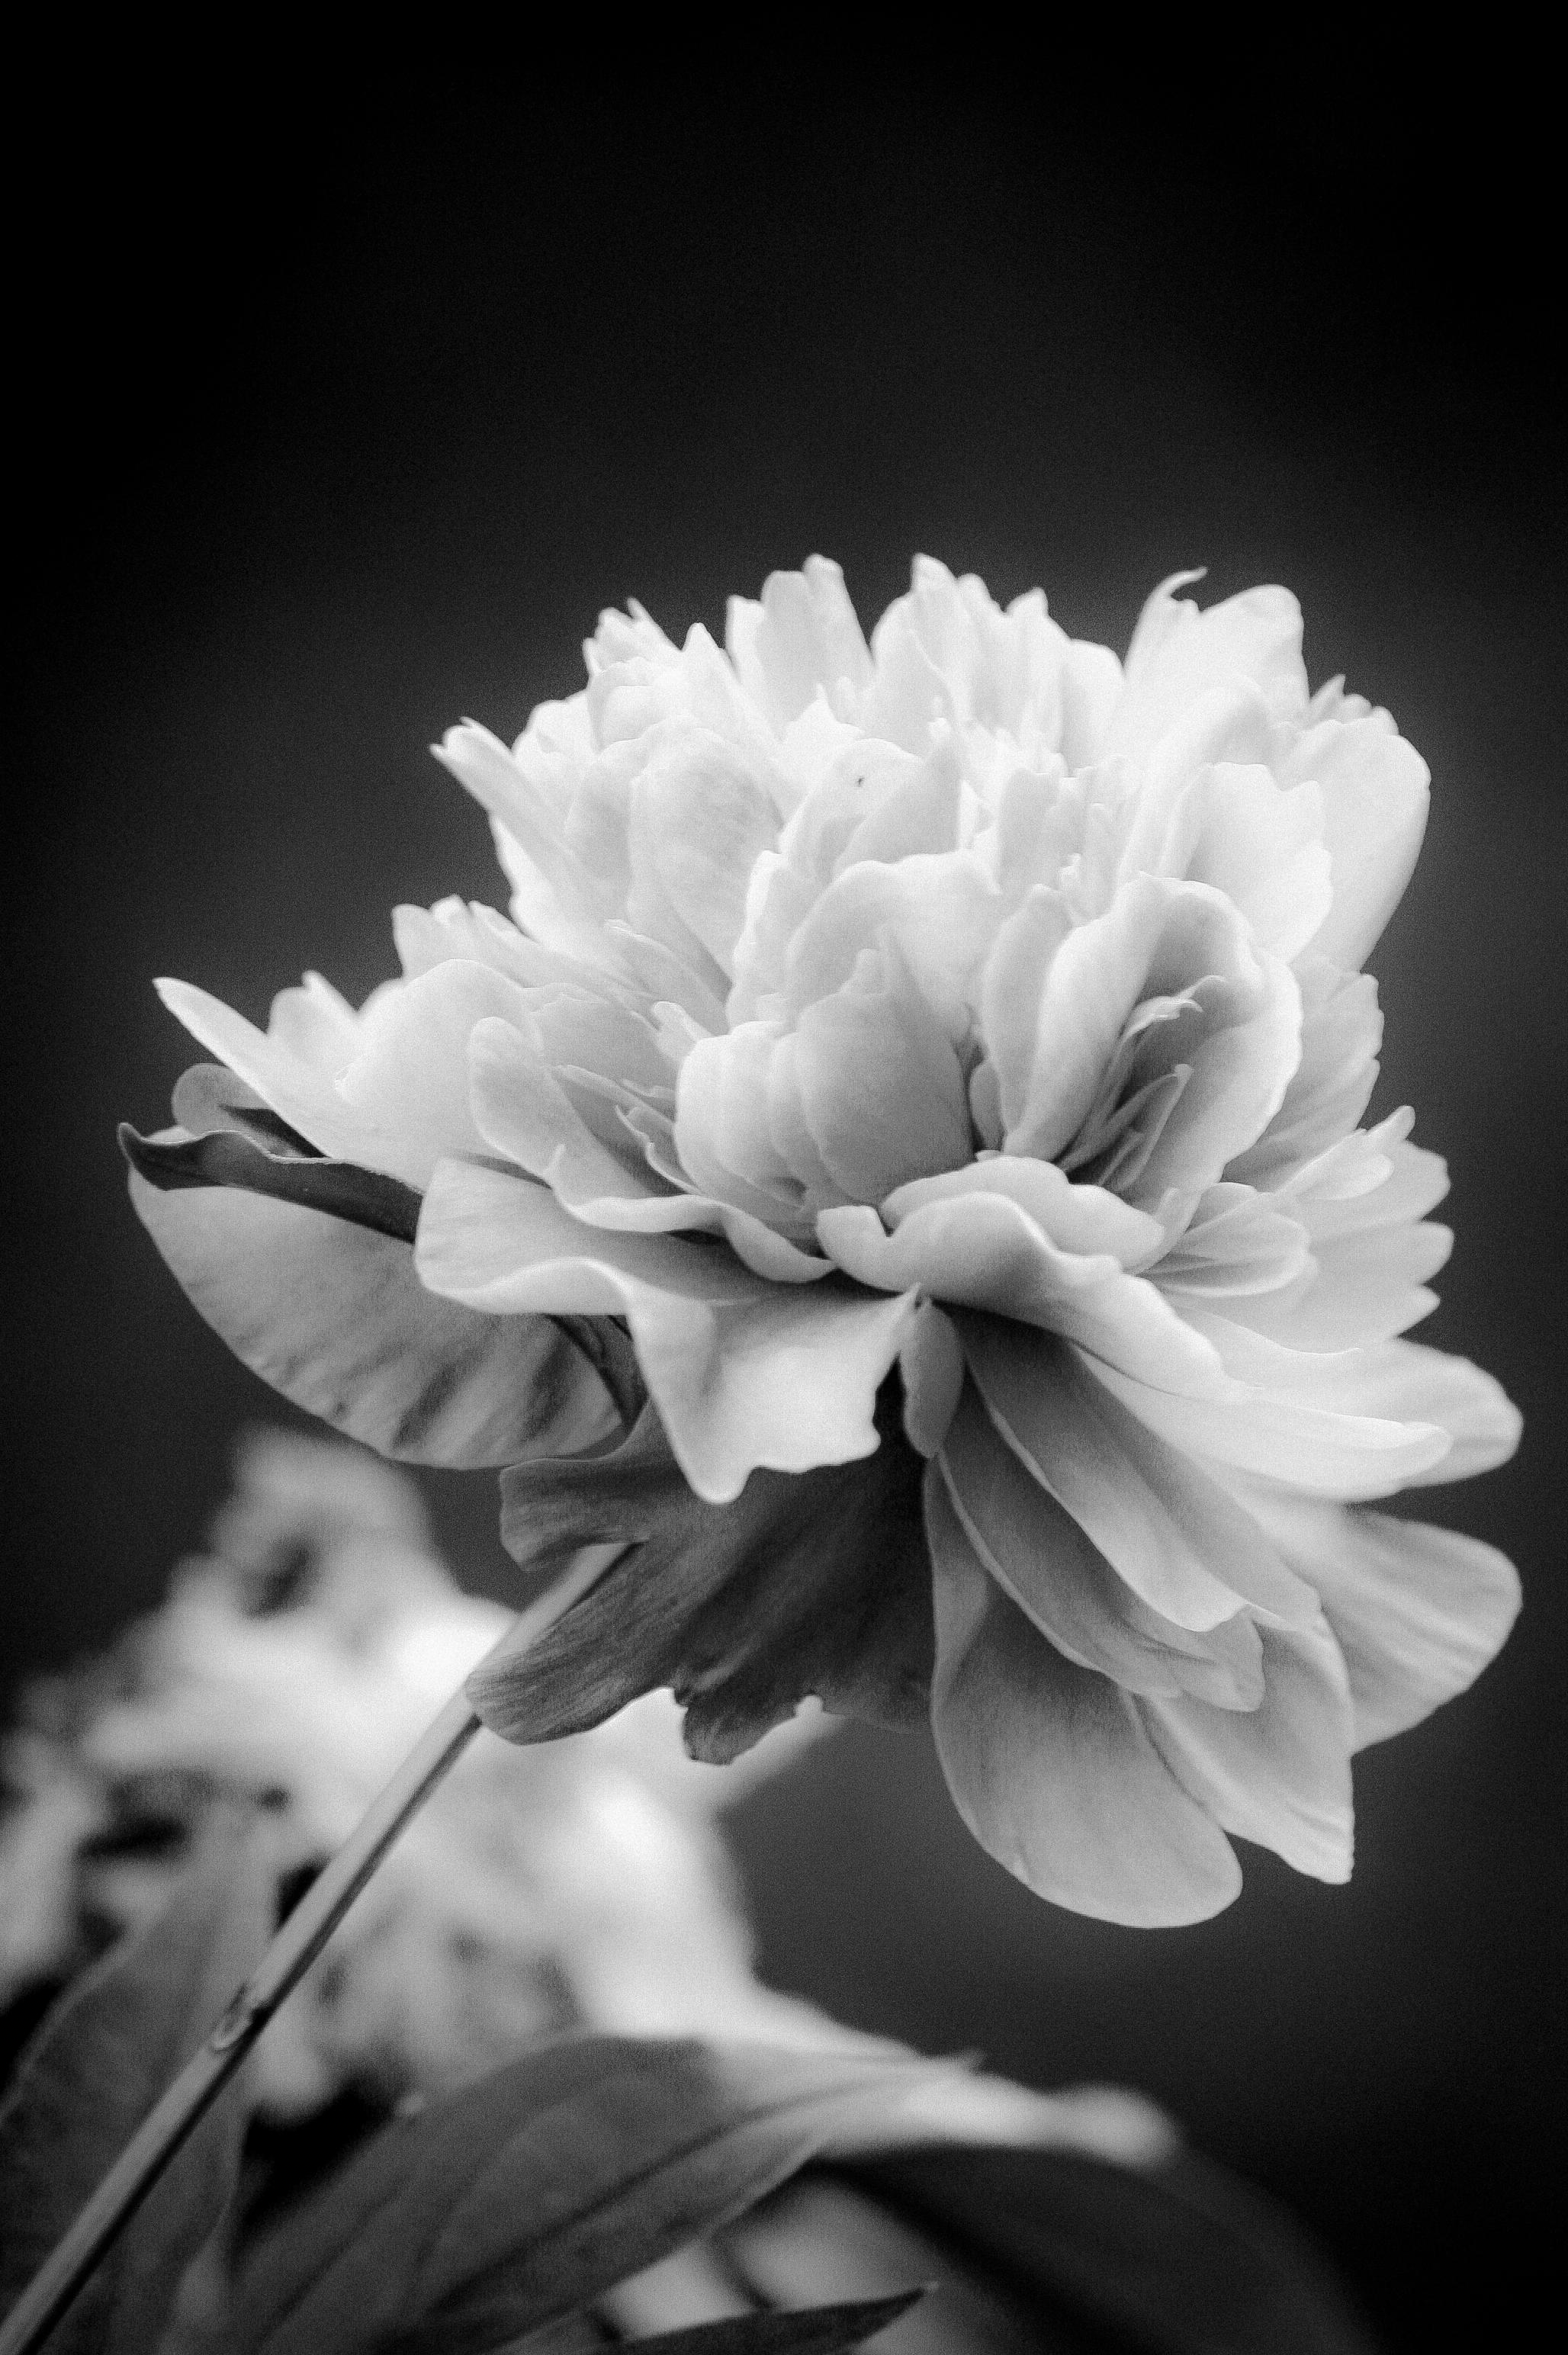 flower dramatic flowers animals plants deviantart nature favourites